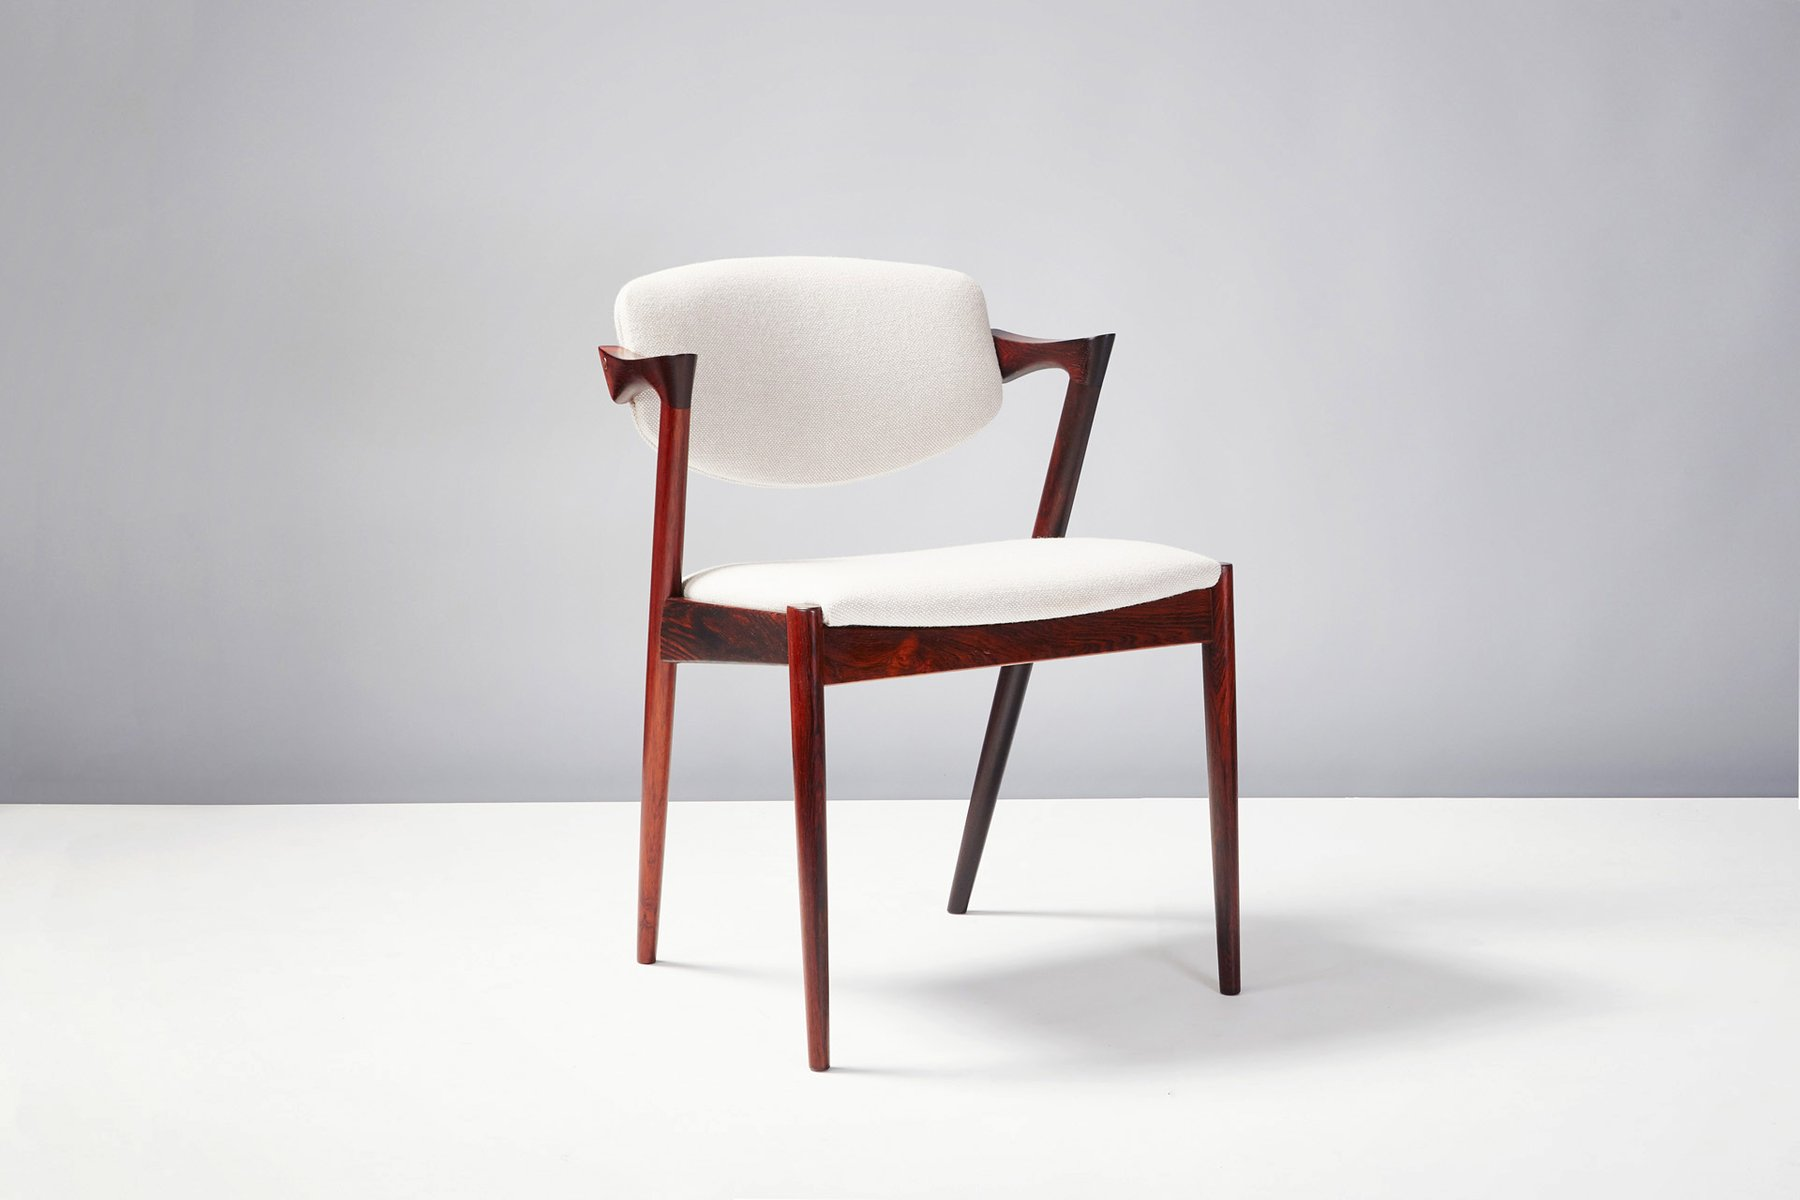 Model 42 Dining Chairs By Kai Kristiansen For Skovman Andersen, 1956, Set  Of 6